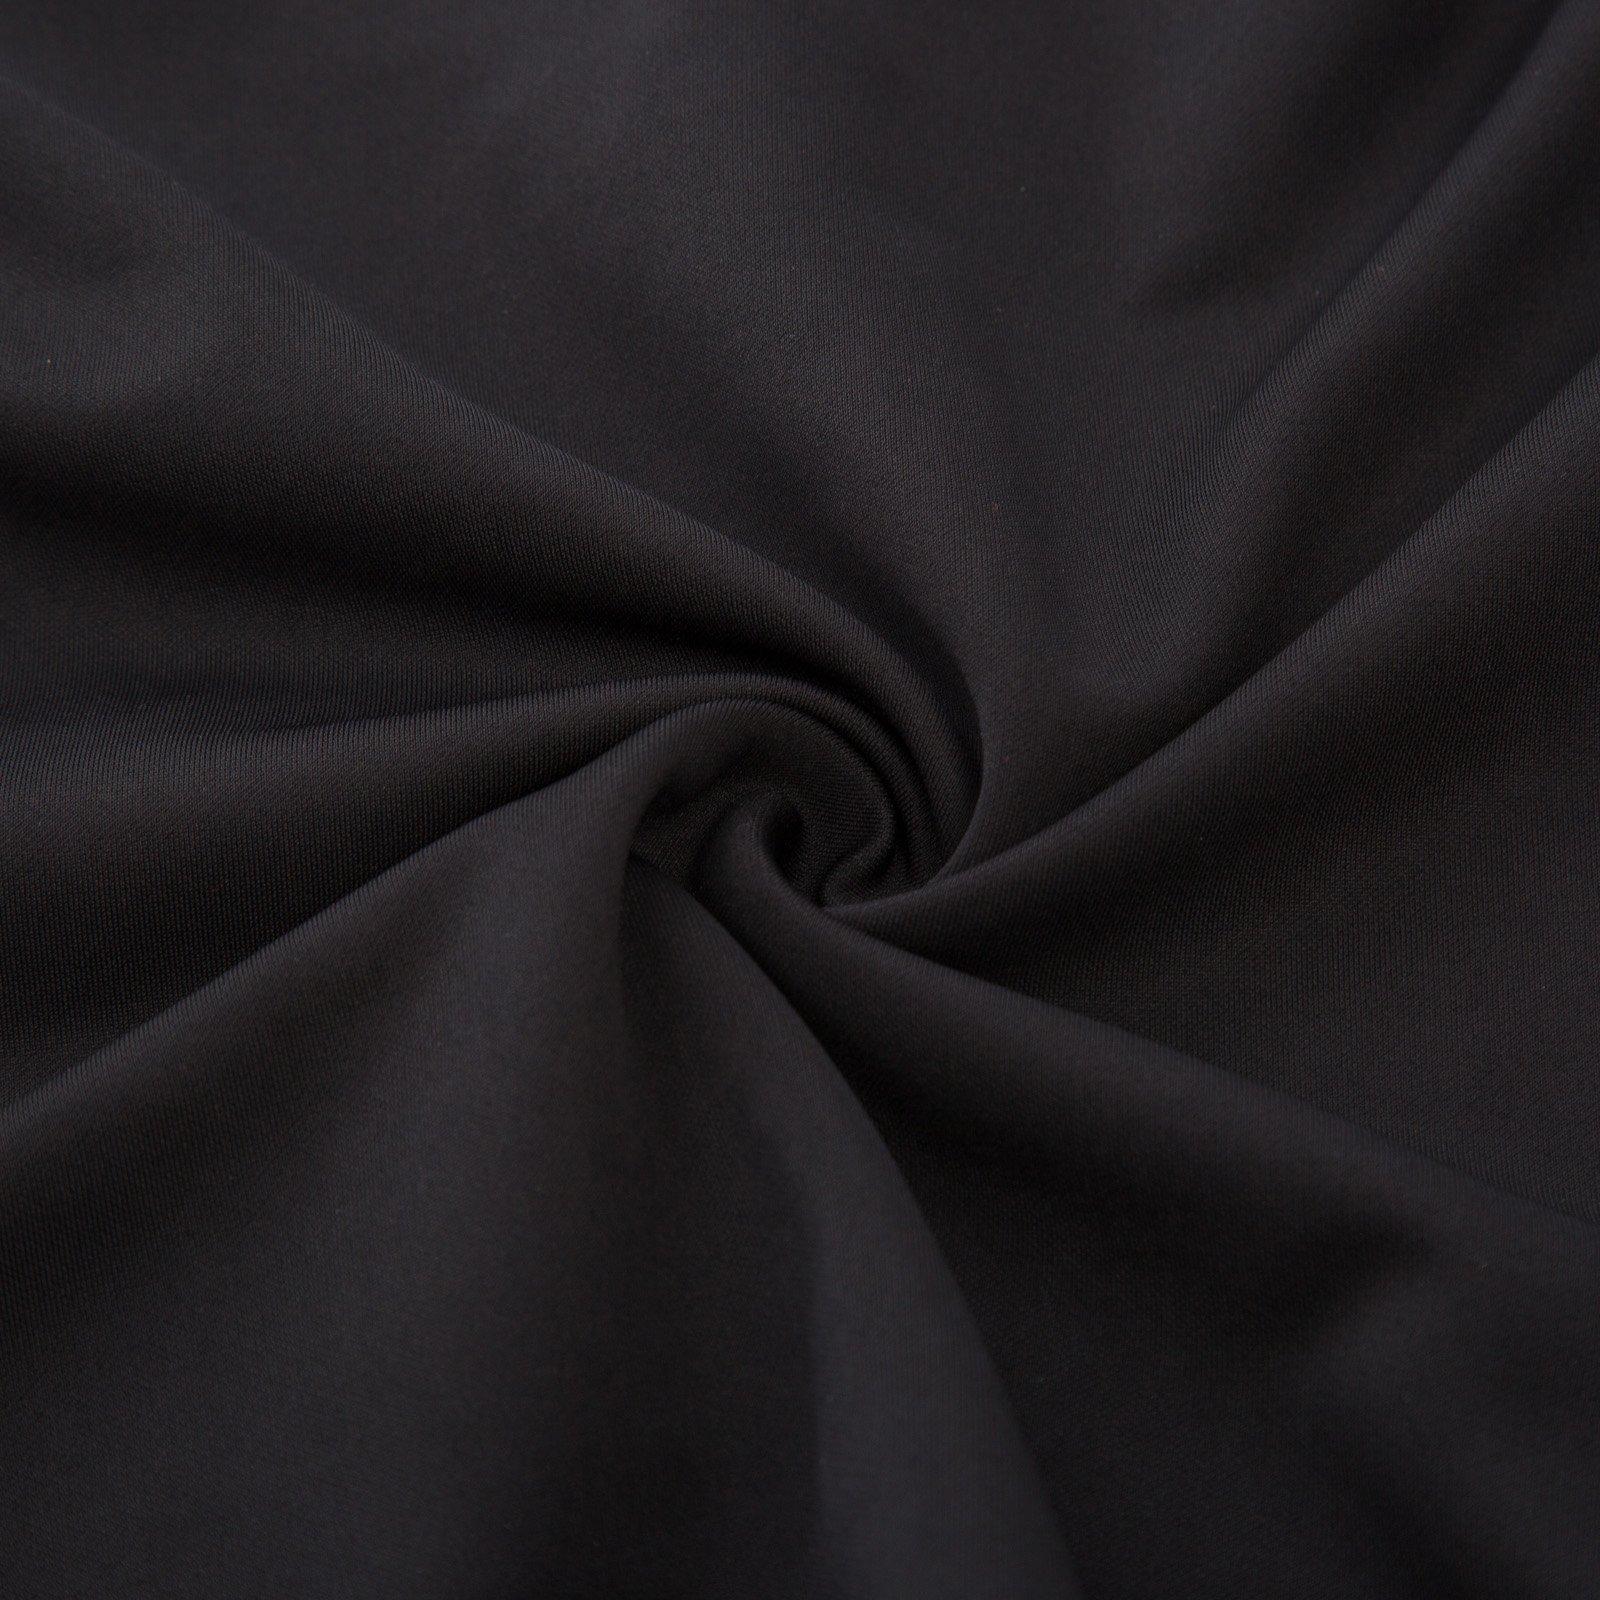 Kate Kasin Women's Stretchy Business Pencil Skirt Office Wear Black 2XL KK949